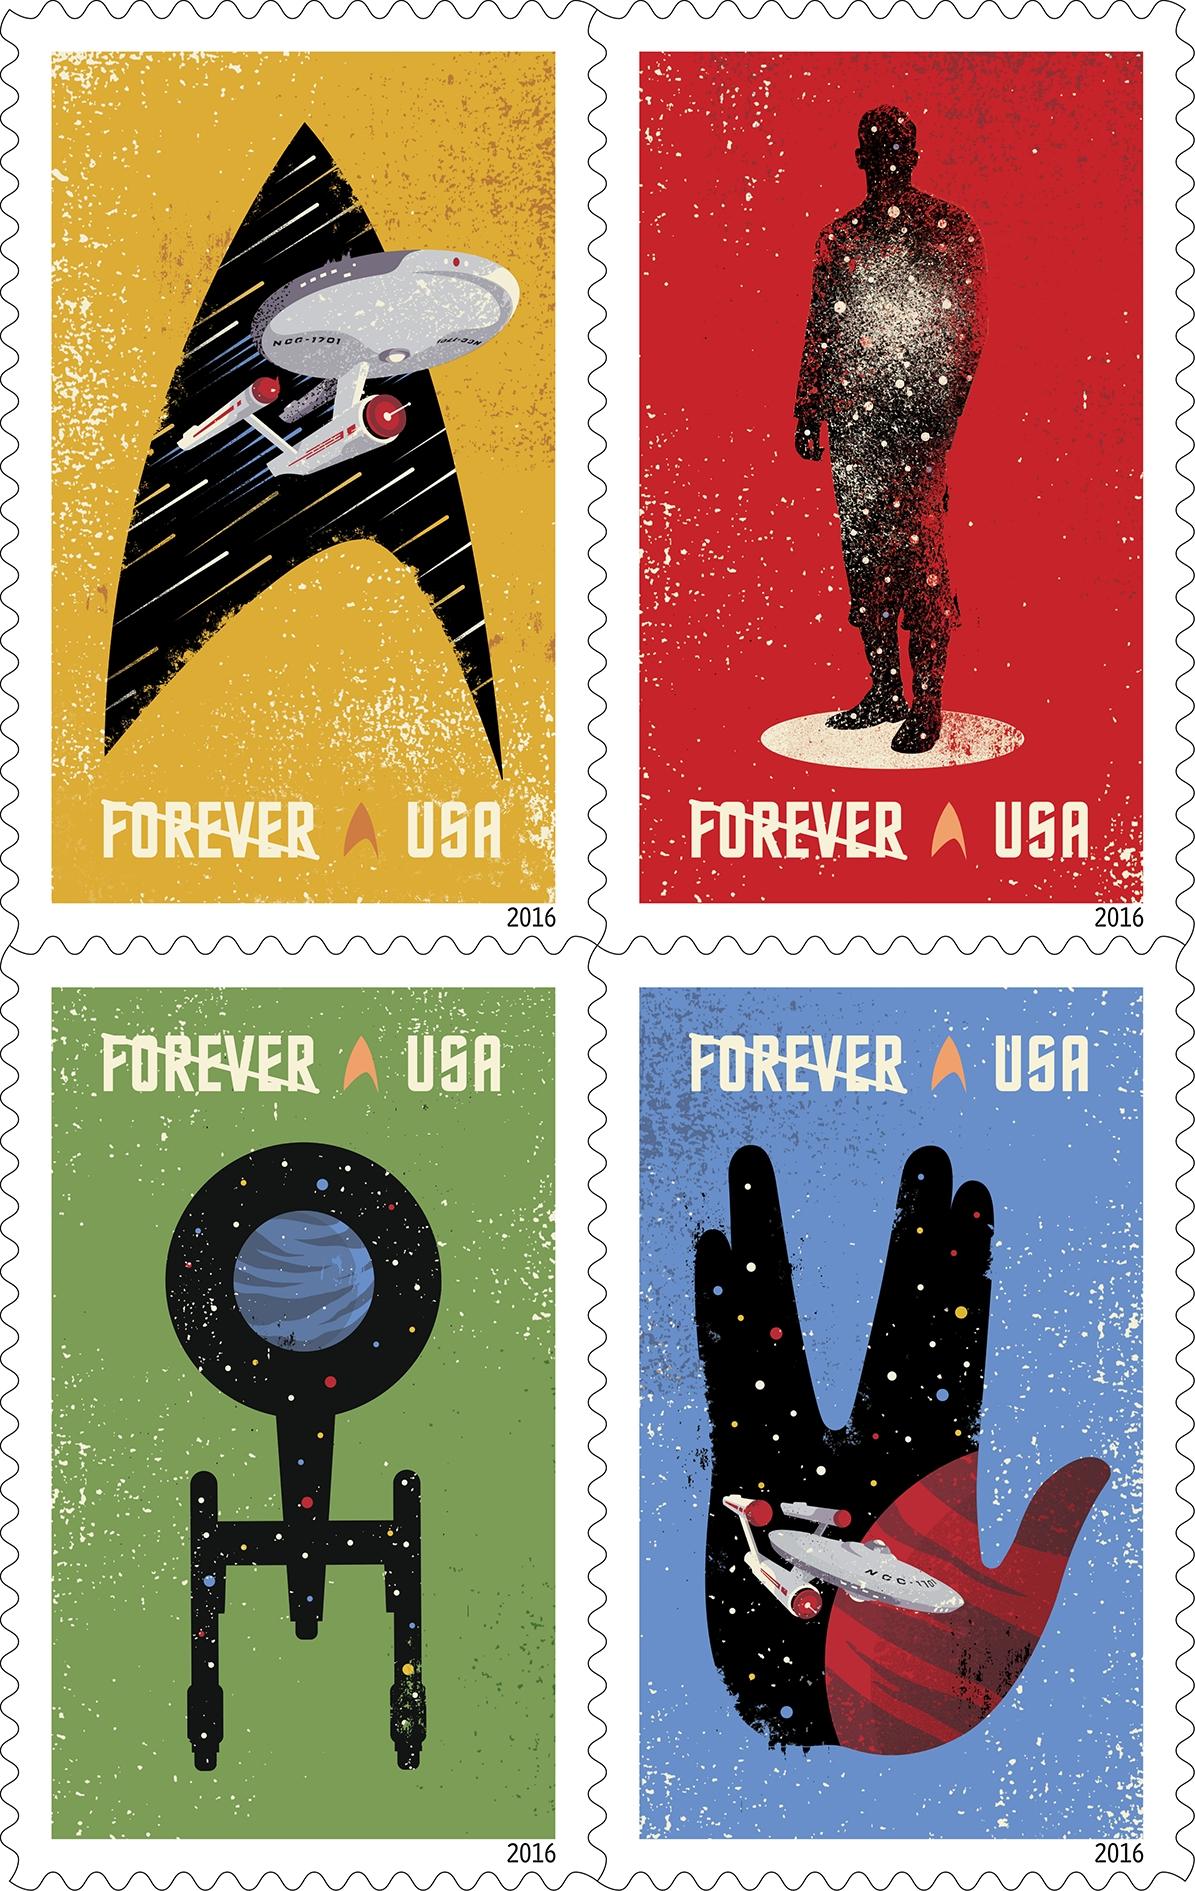 U.S. Post Office to Release 'Star Trek' Stamps